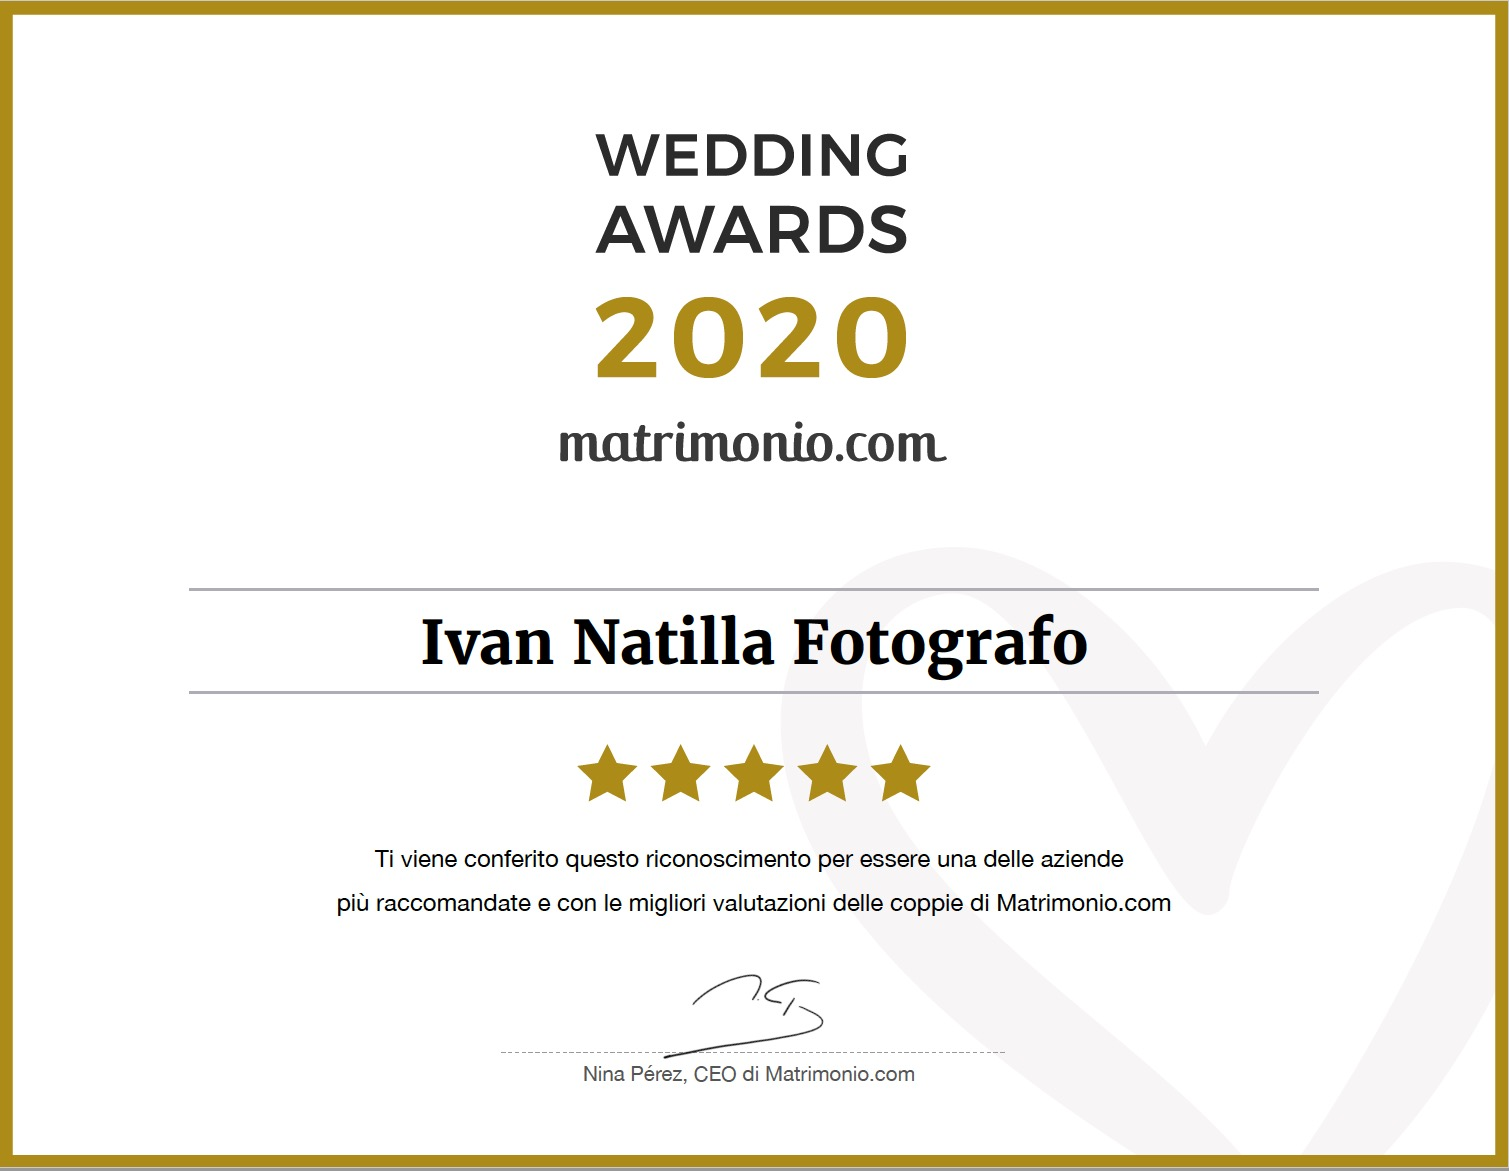 wedding award 2020